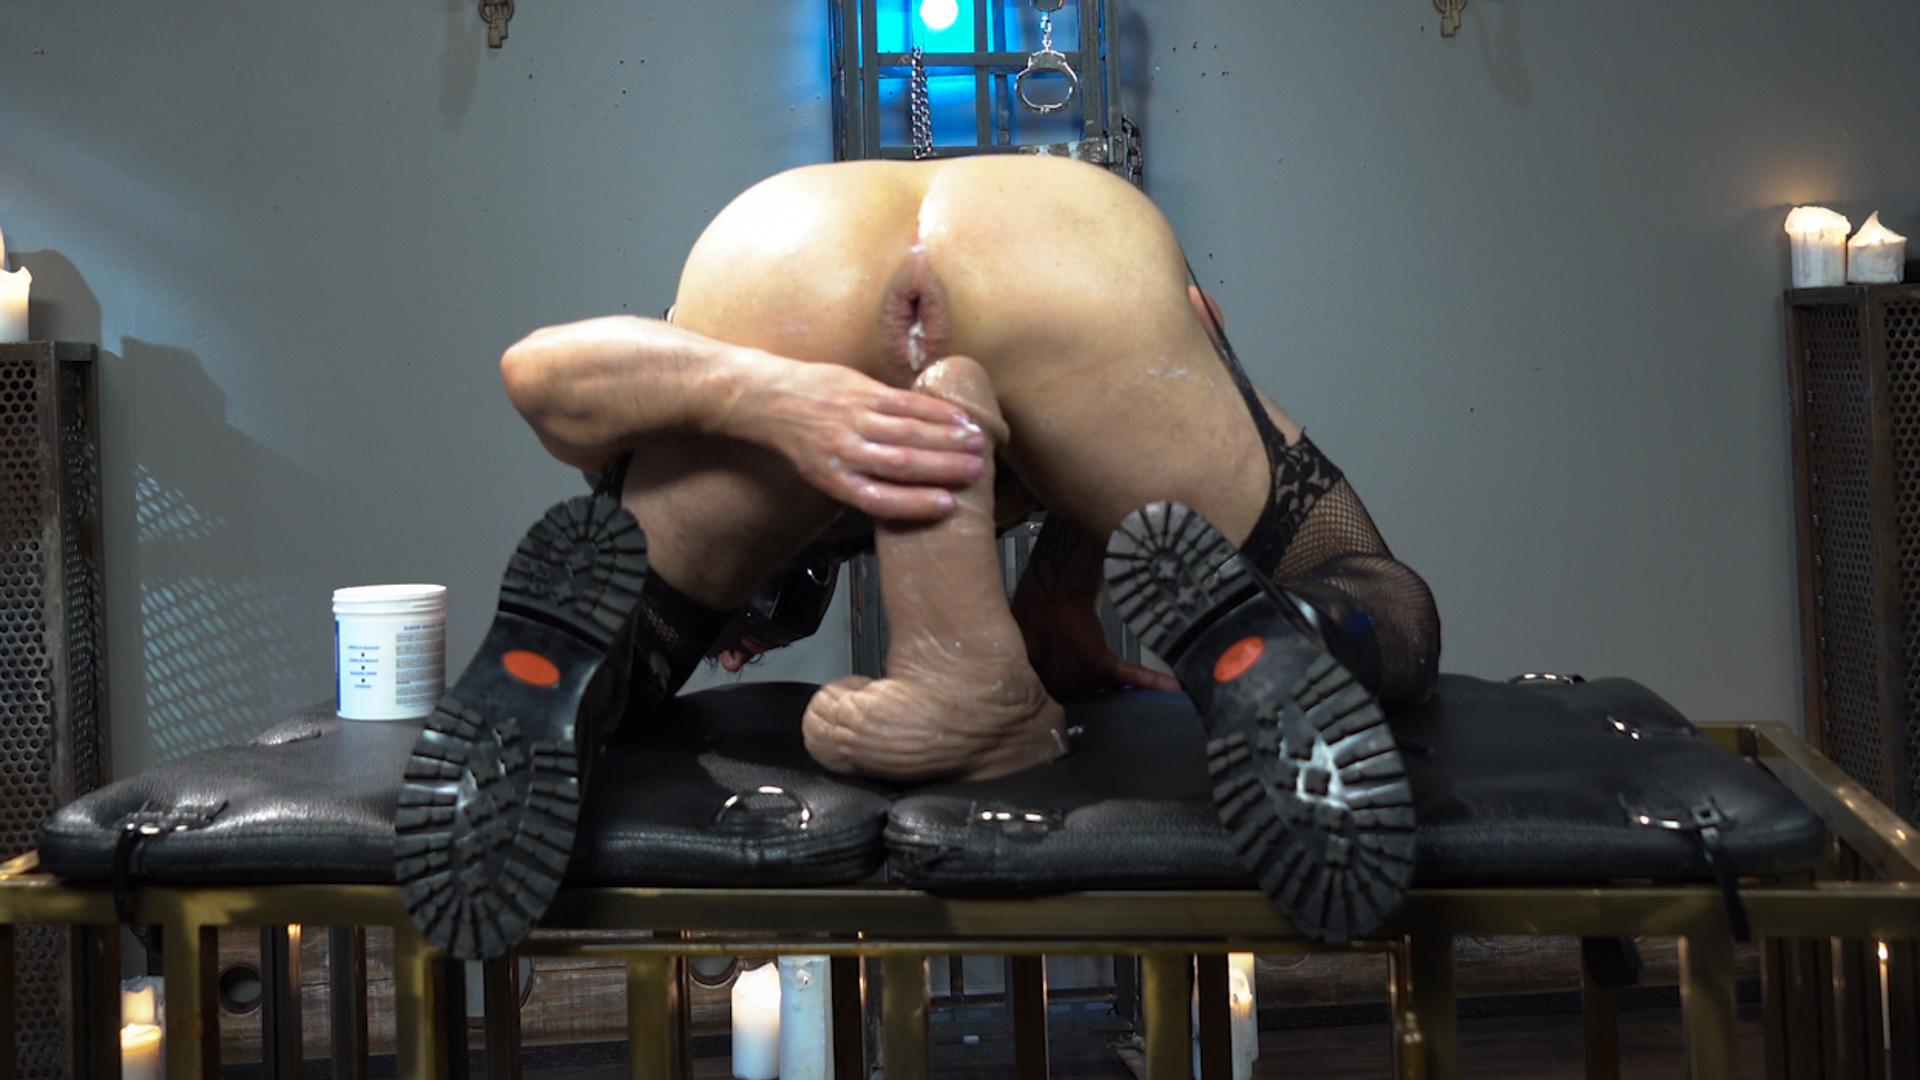 Photo number 15 from Corbin Dallas Is The Sneak shot for Kinky Bites Men on Kink.com. Featuring Corbin Dallas in hardcore BDSM & Fetish porn.